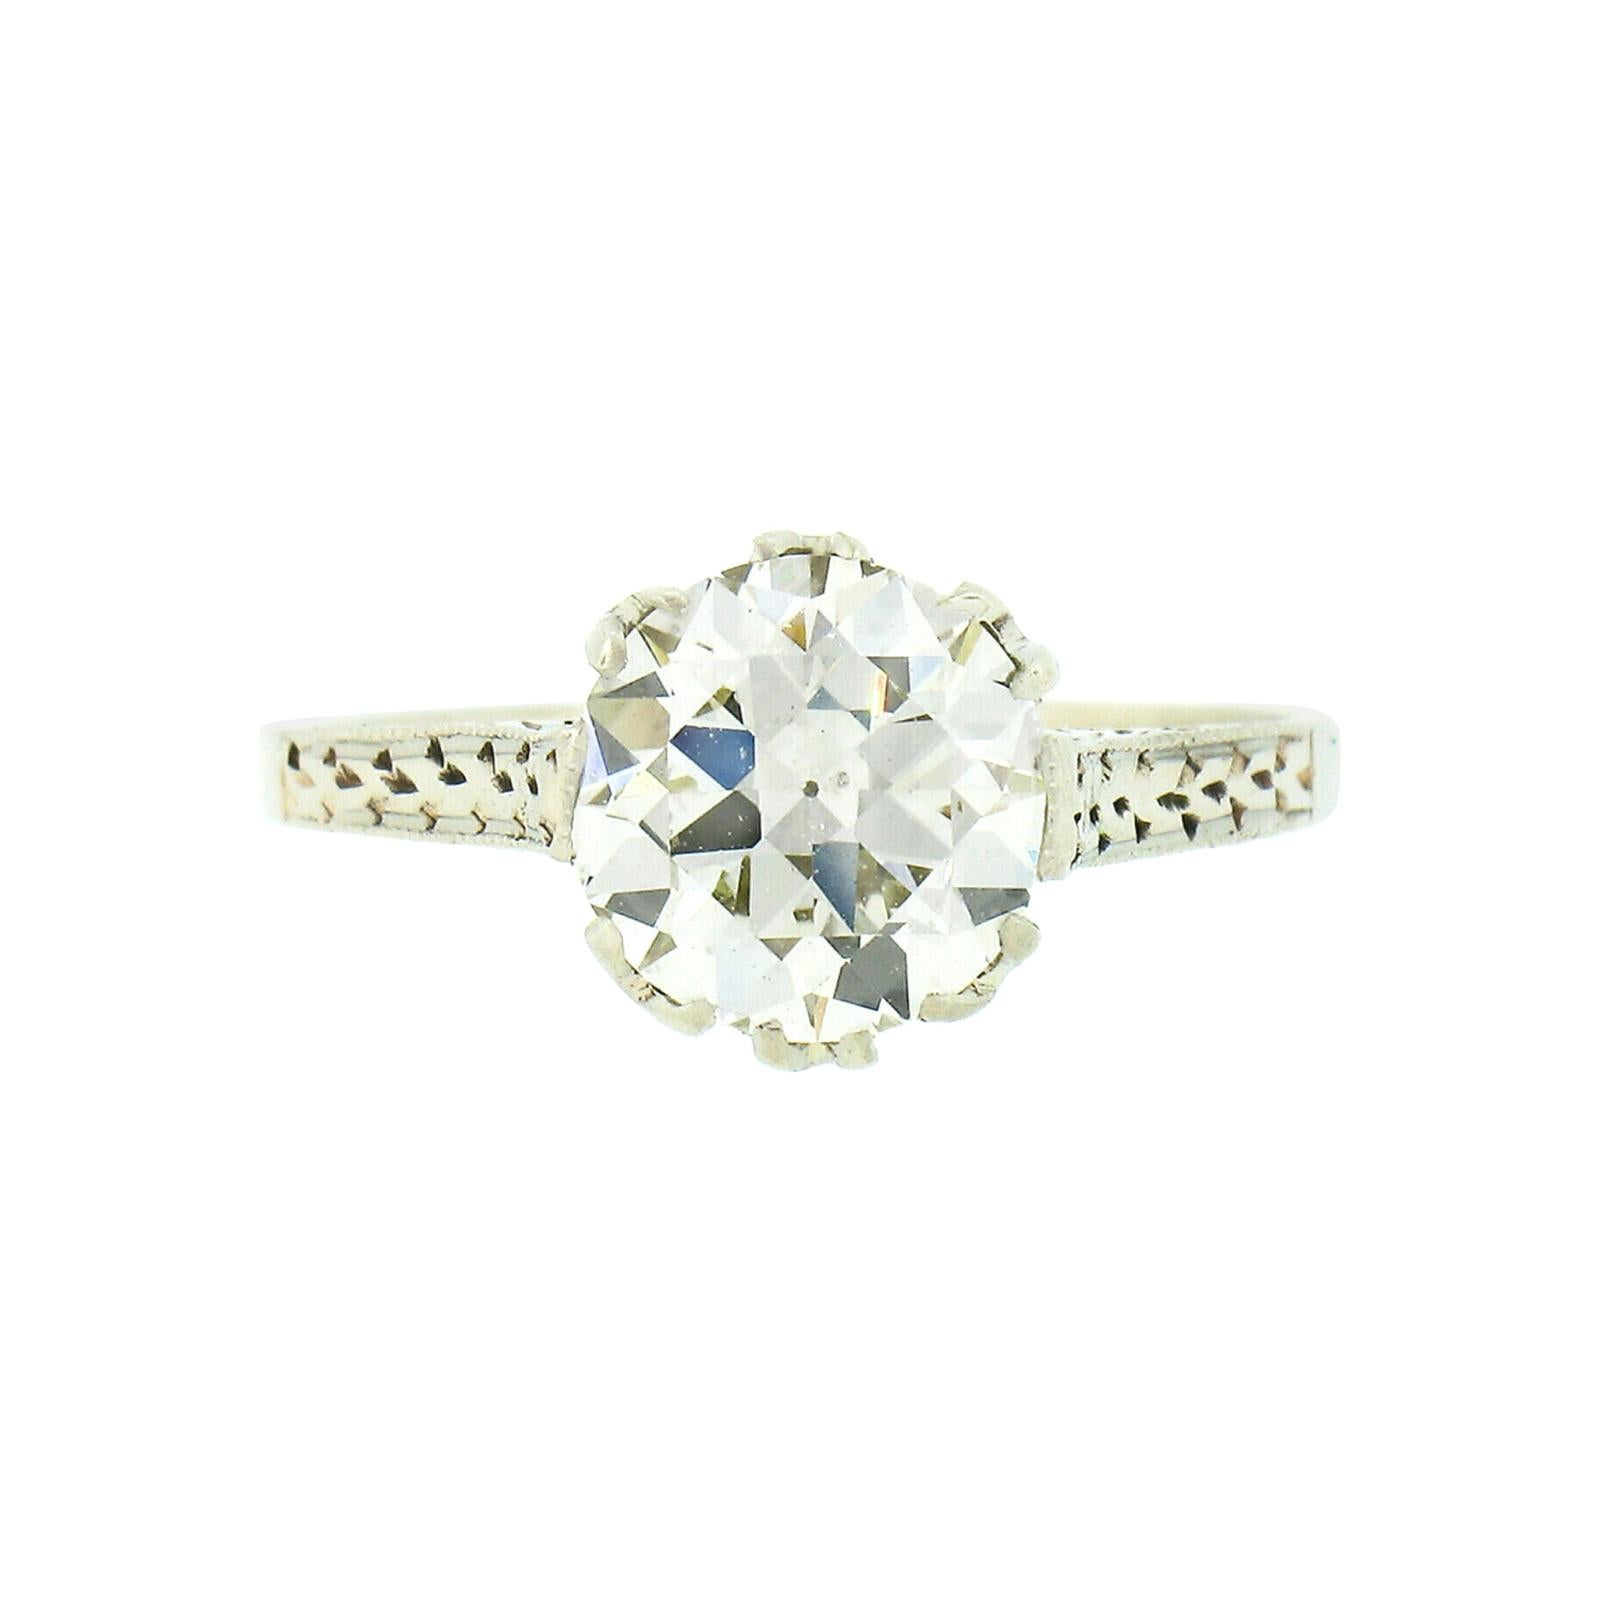 Antique Art Deco 14k White Gold 1.70ct GIA Old Diamond Engraved Engagement Ring